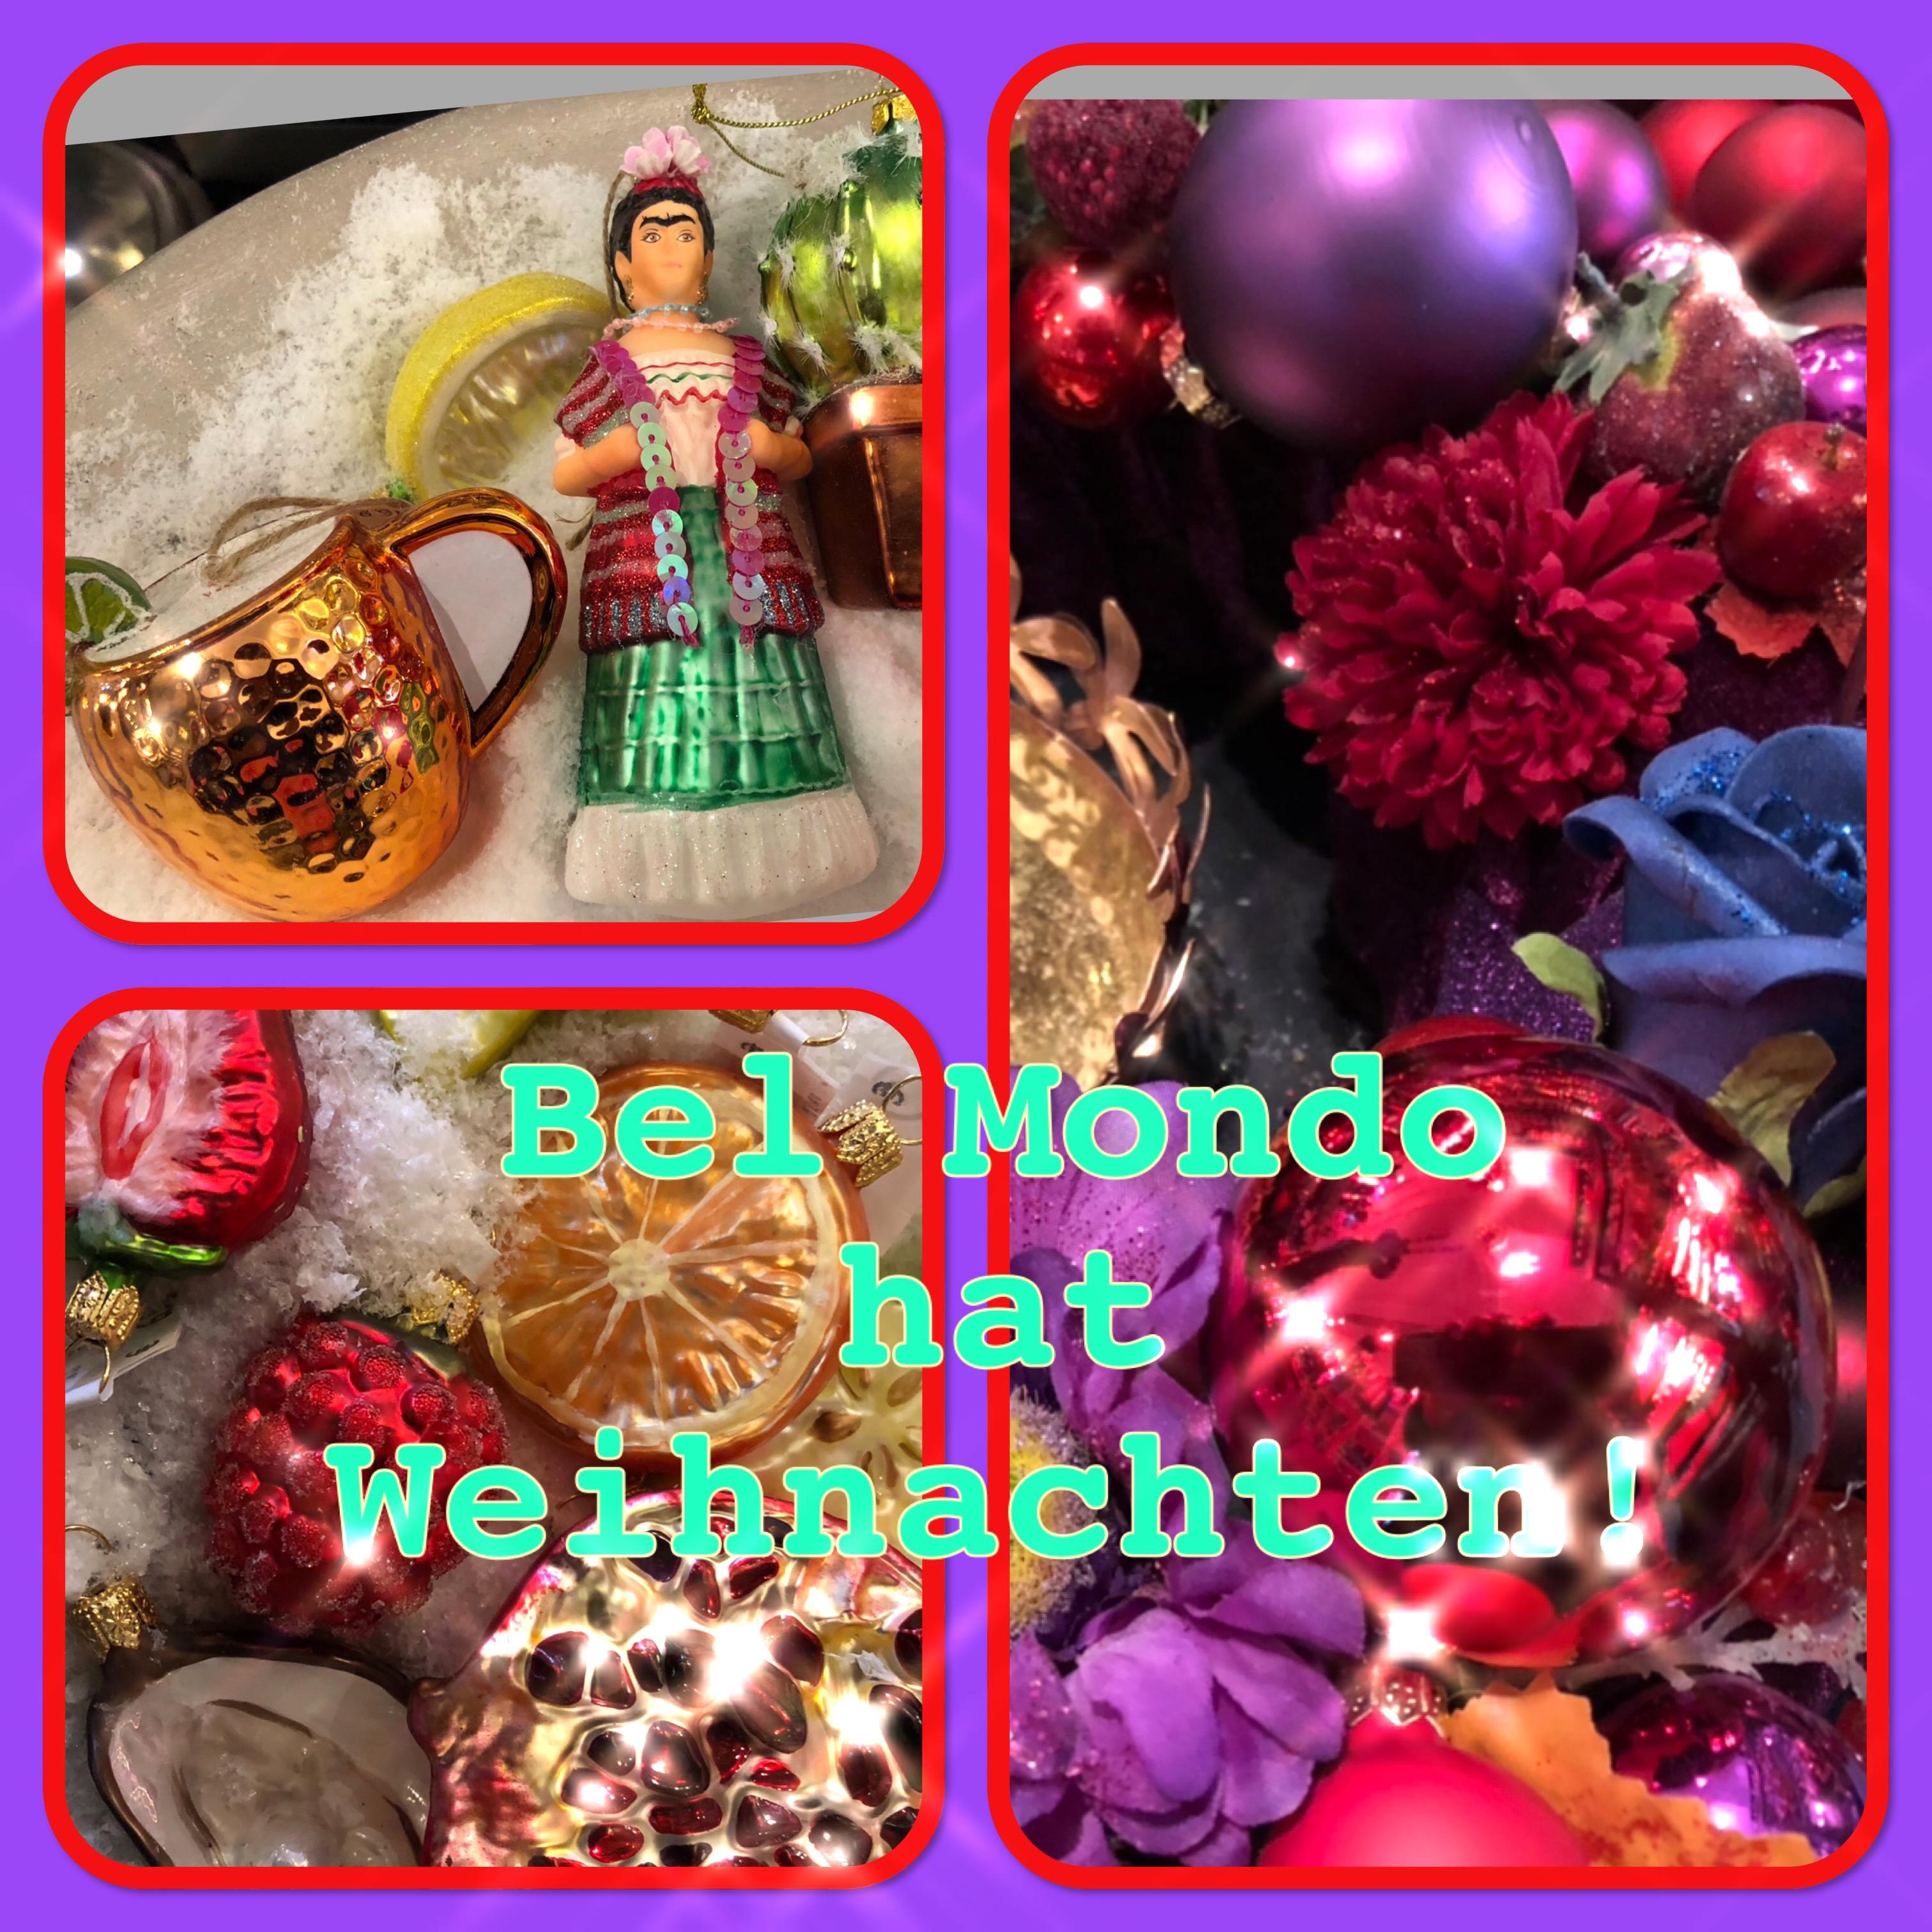 Weihnachtsdeko | Geschenkideen Erlangen Bel Mondo